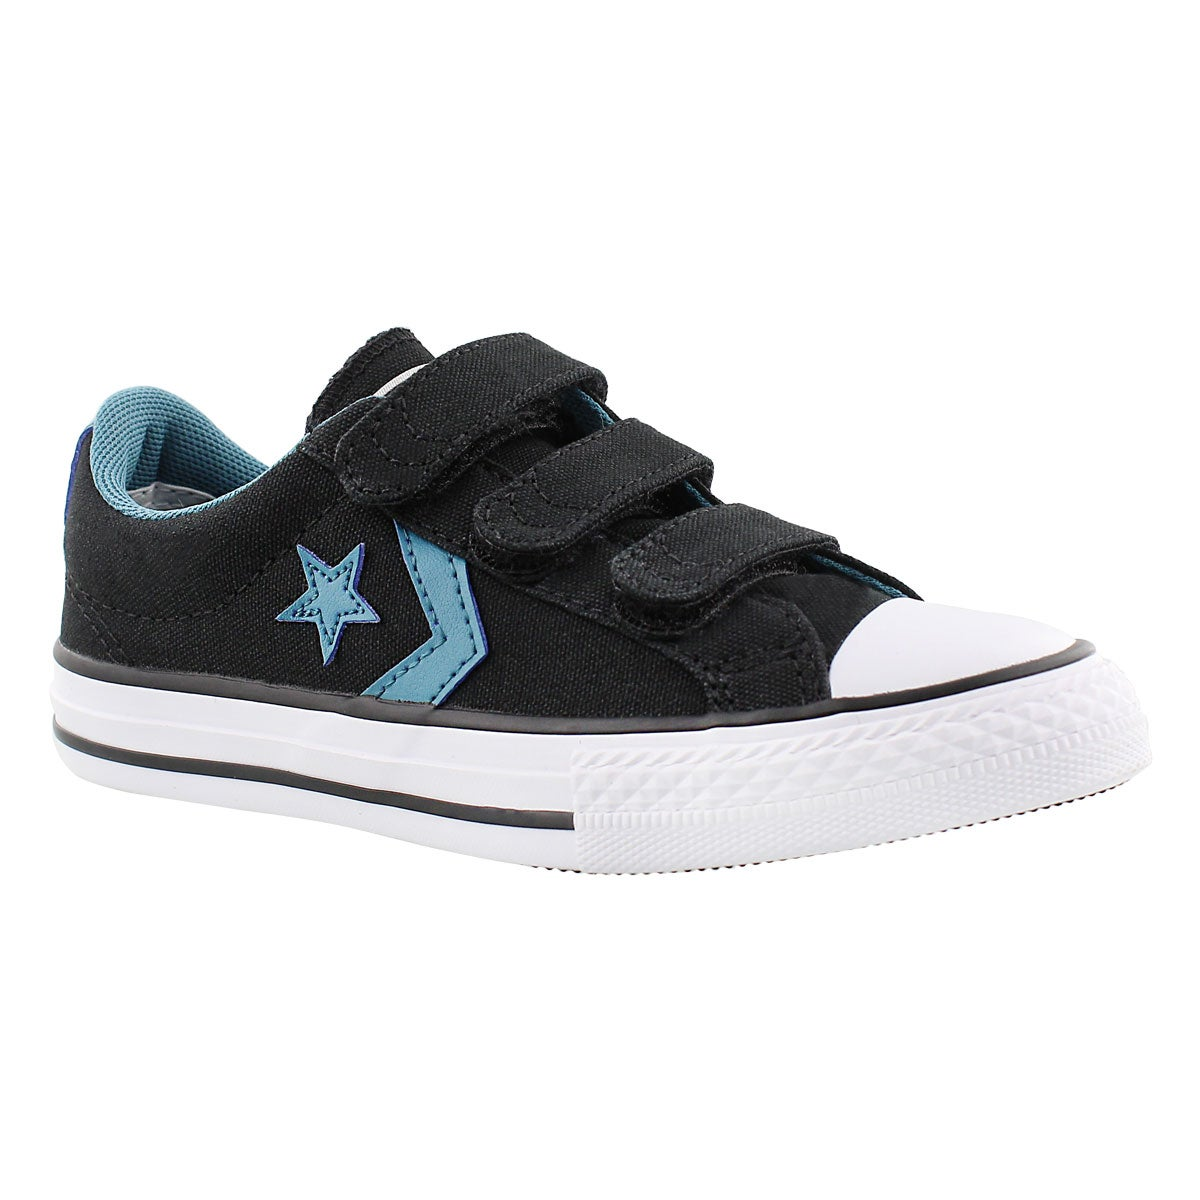 Bys CT Star Player EV 3V blk sneaker